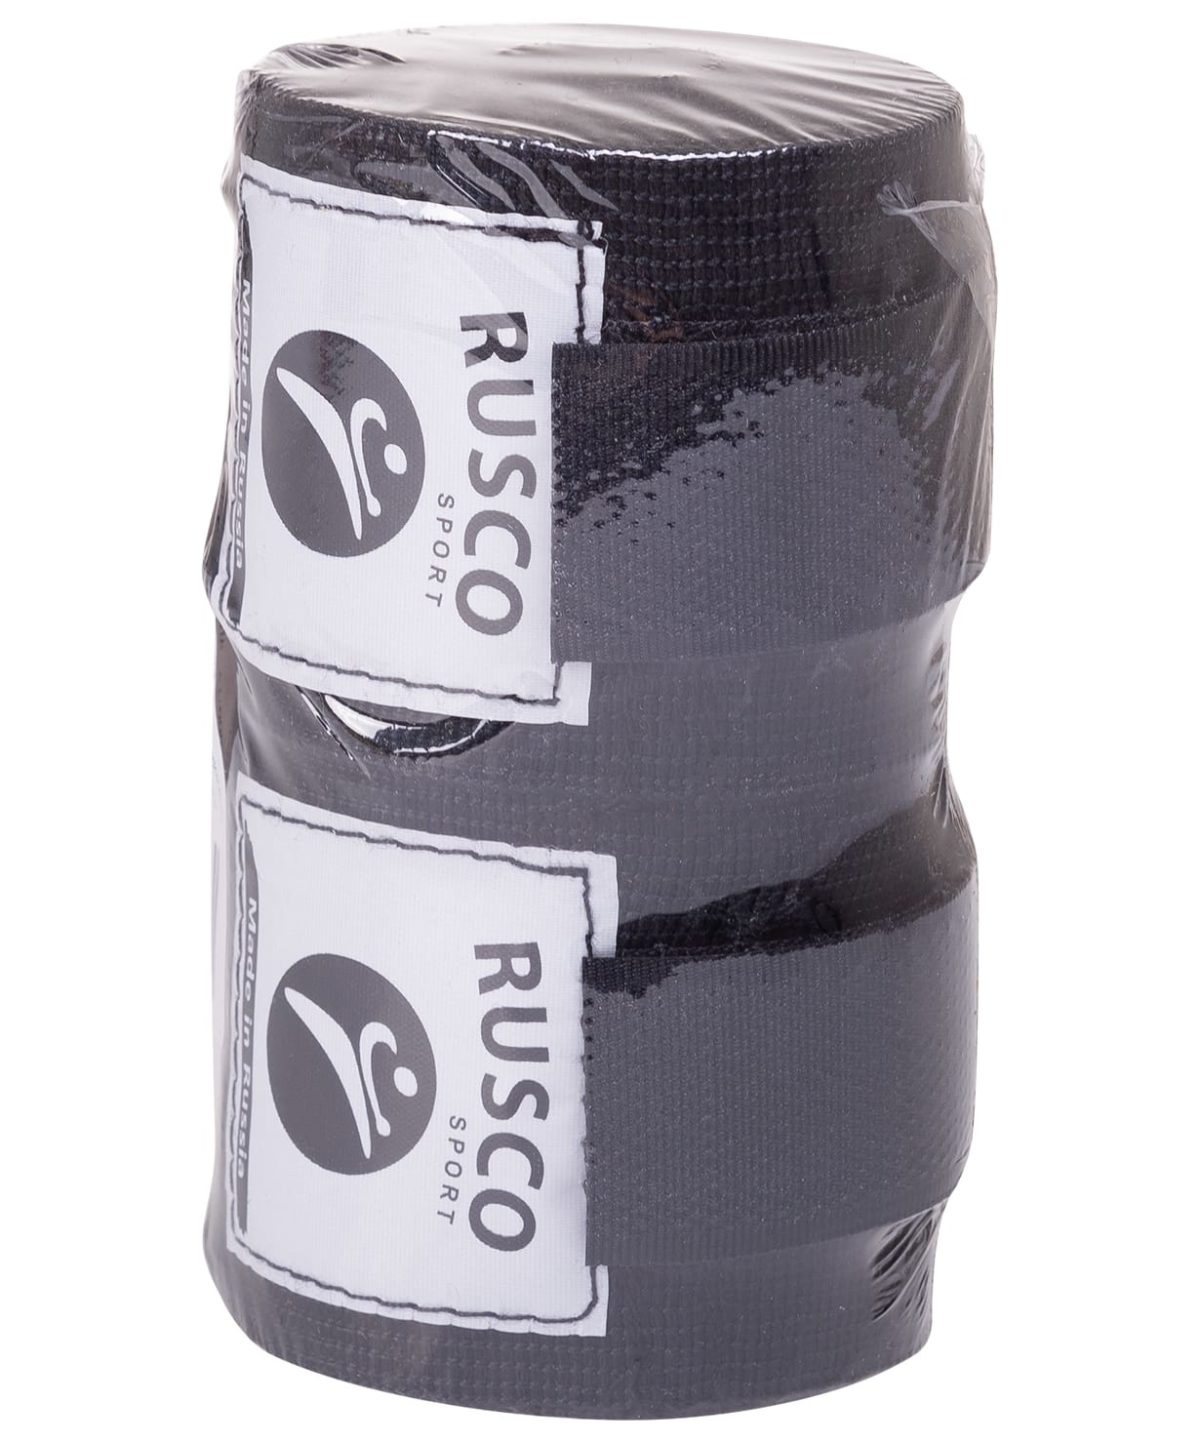 RUSCO Бинт боксерский, 2,5м, хлопок  126: чёрный - 3